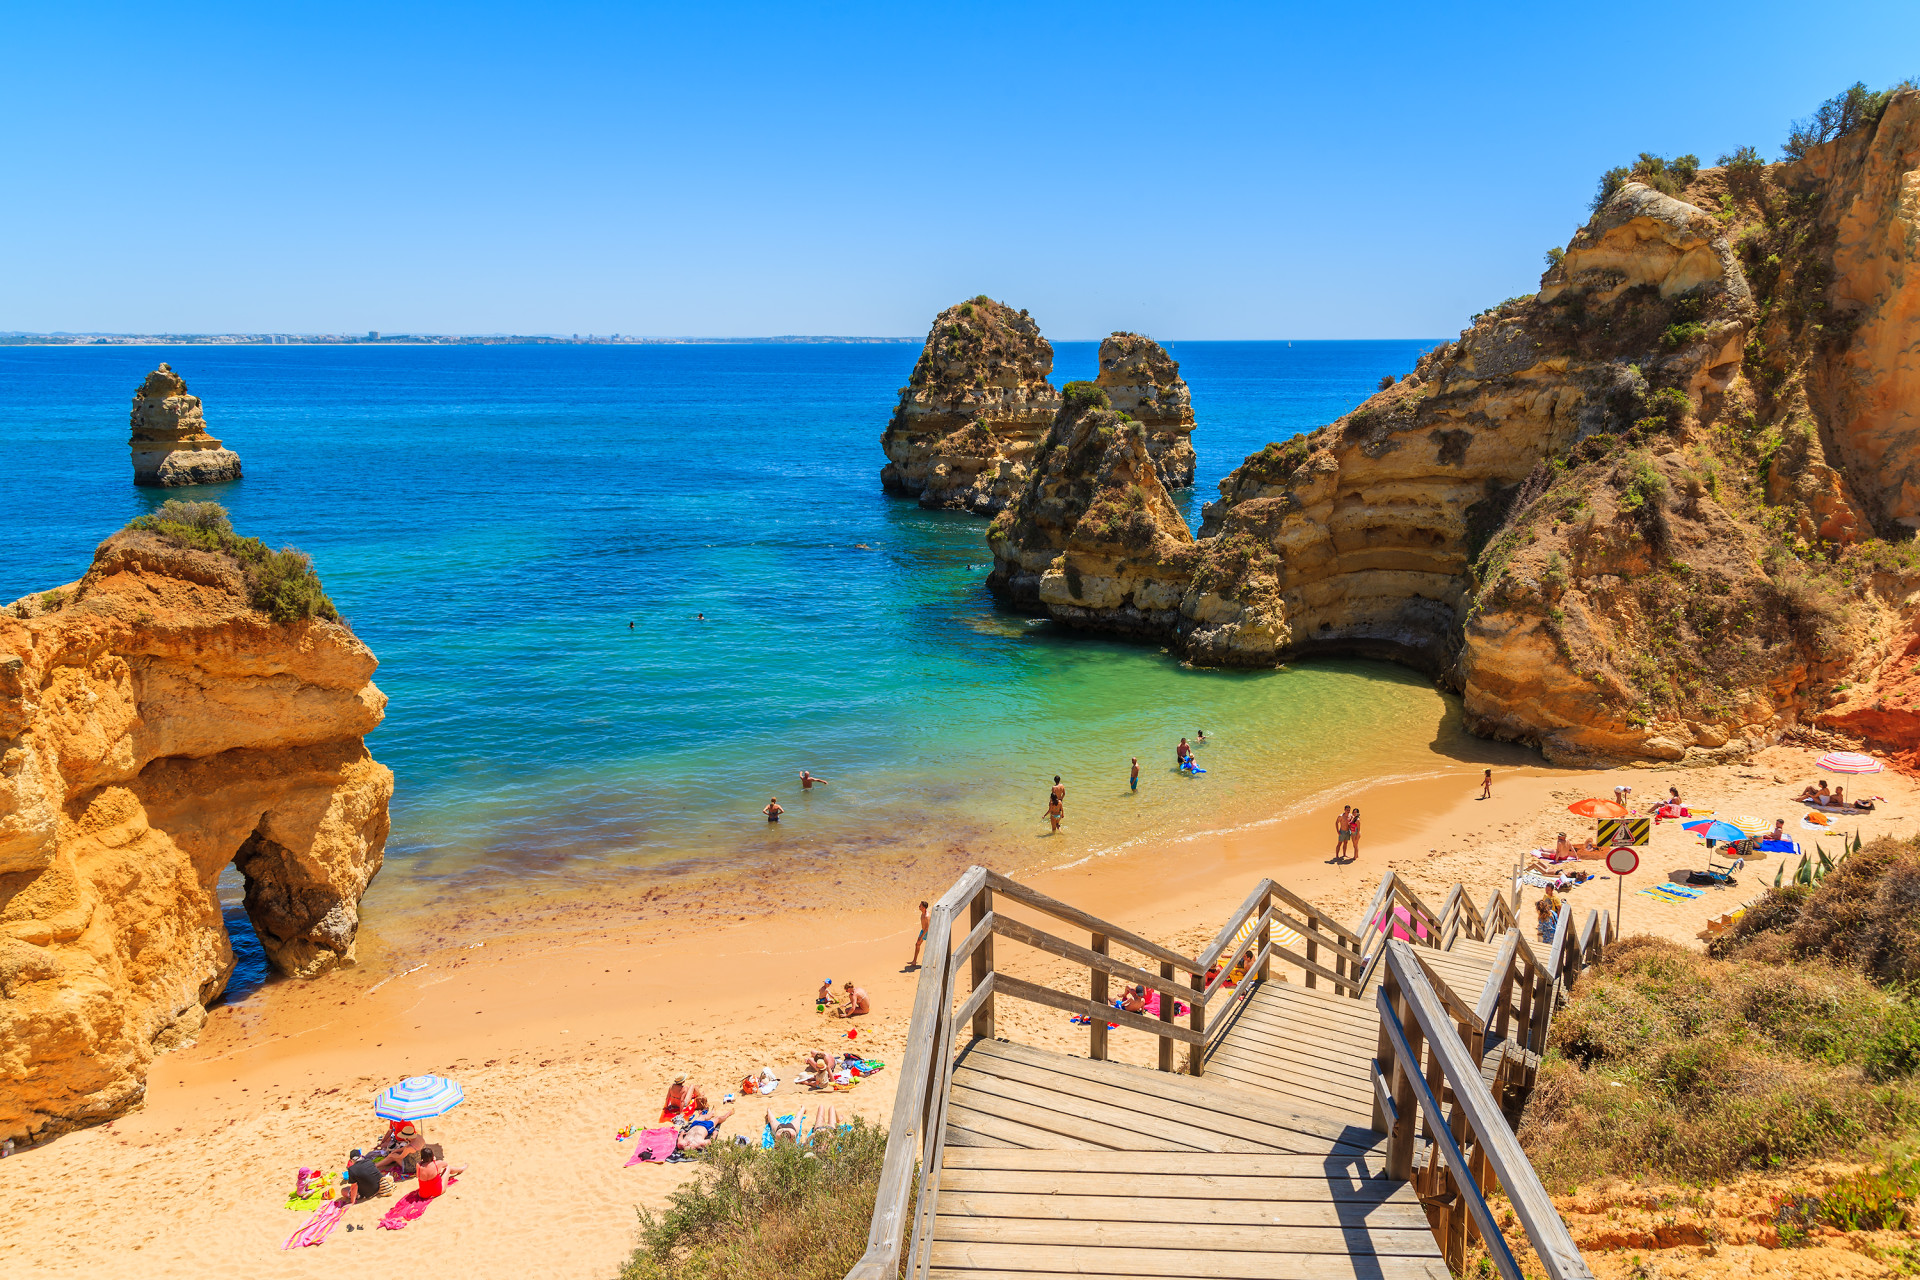 Houten Voetbrug naar Strand, Praia do Camilo Portugal Zonvakantie Portugal